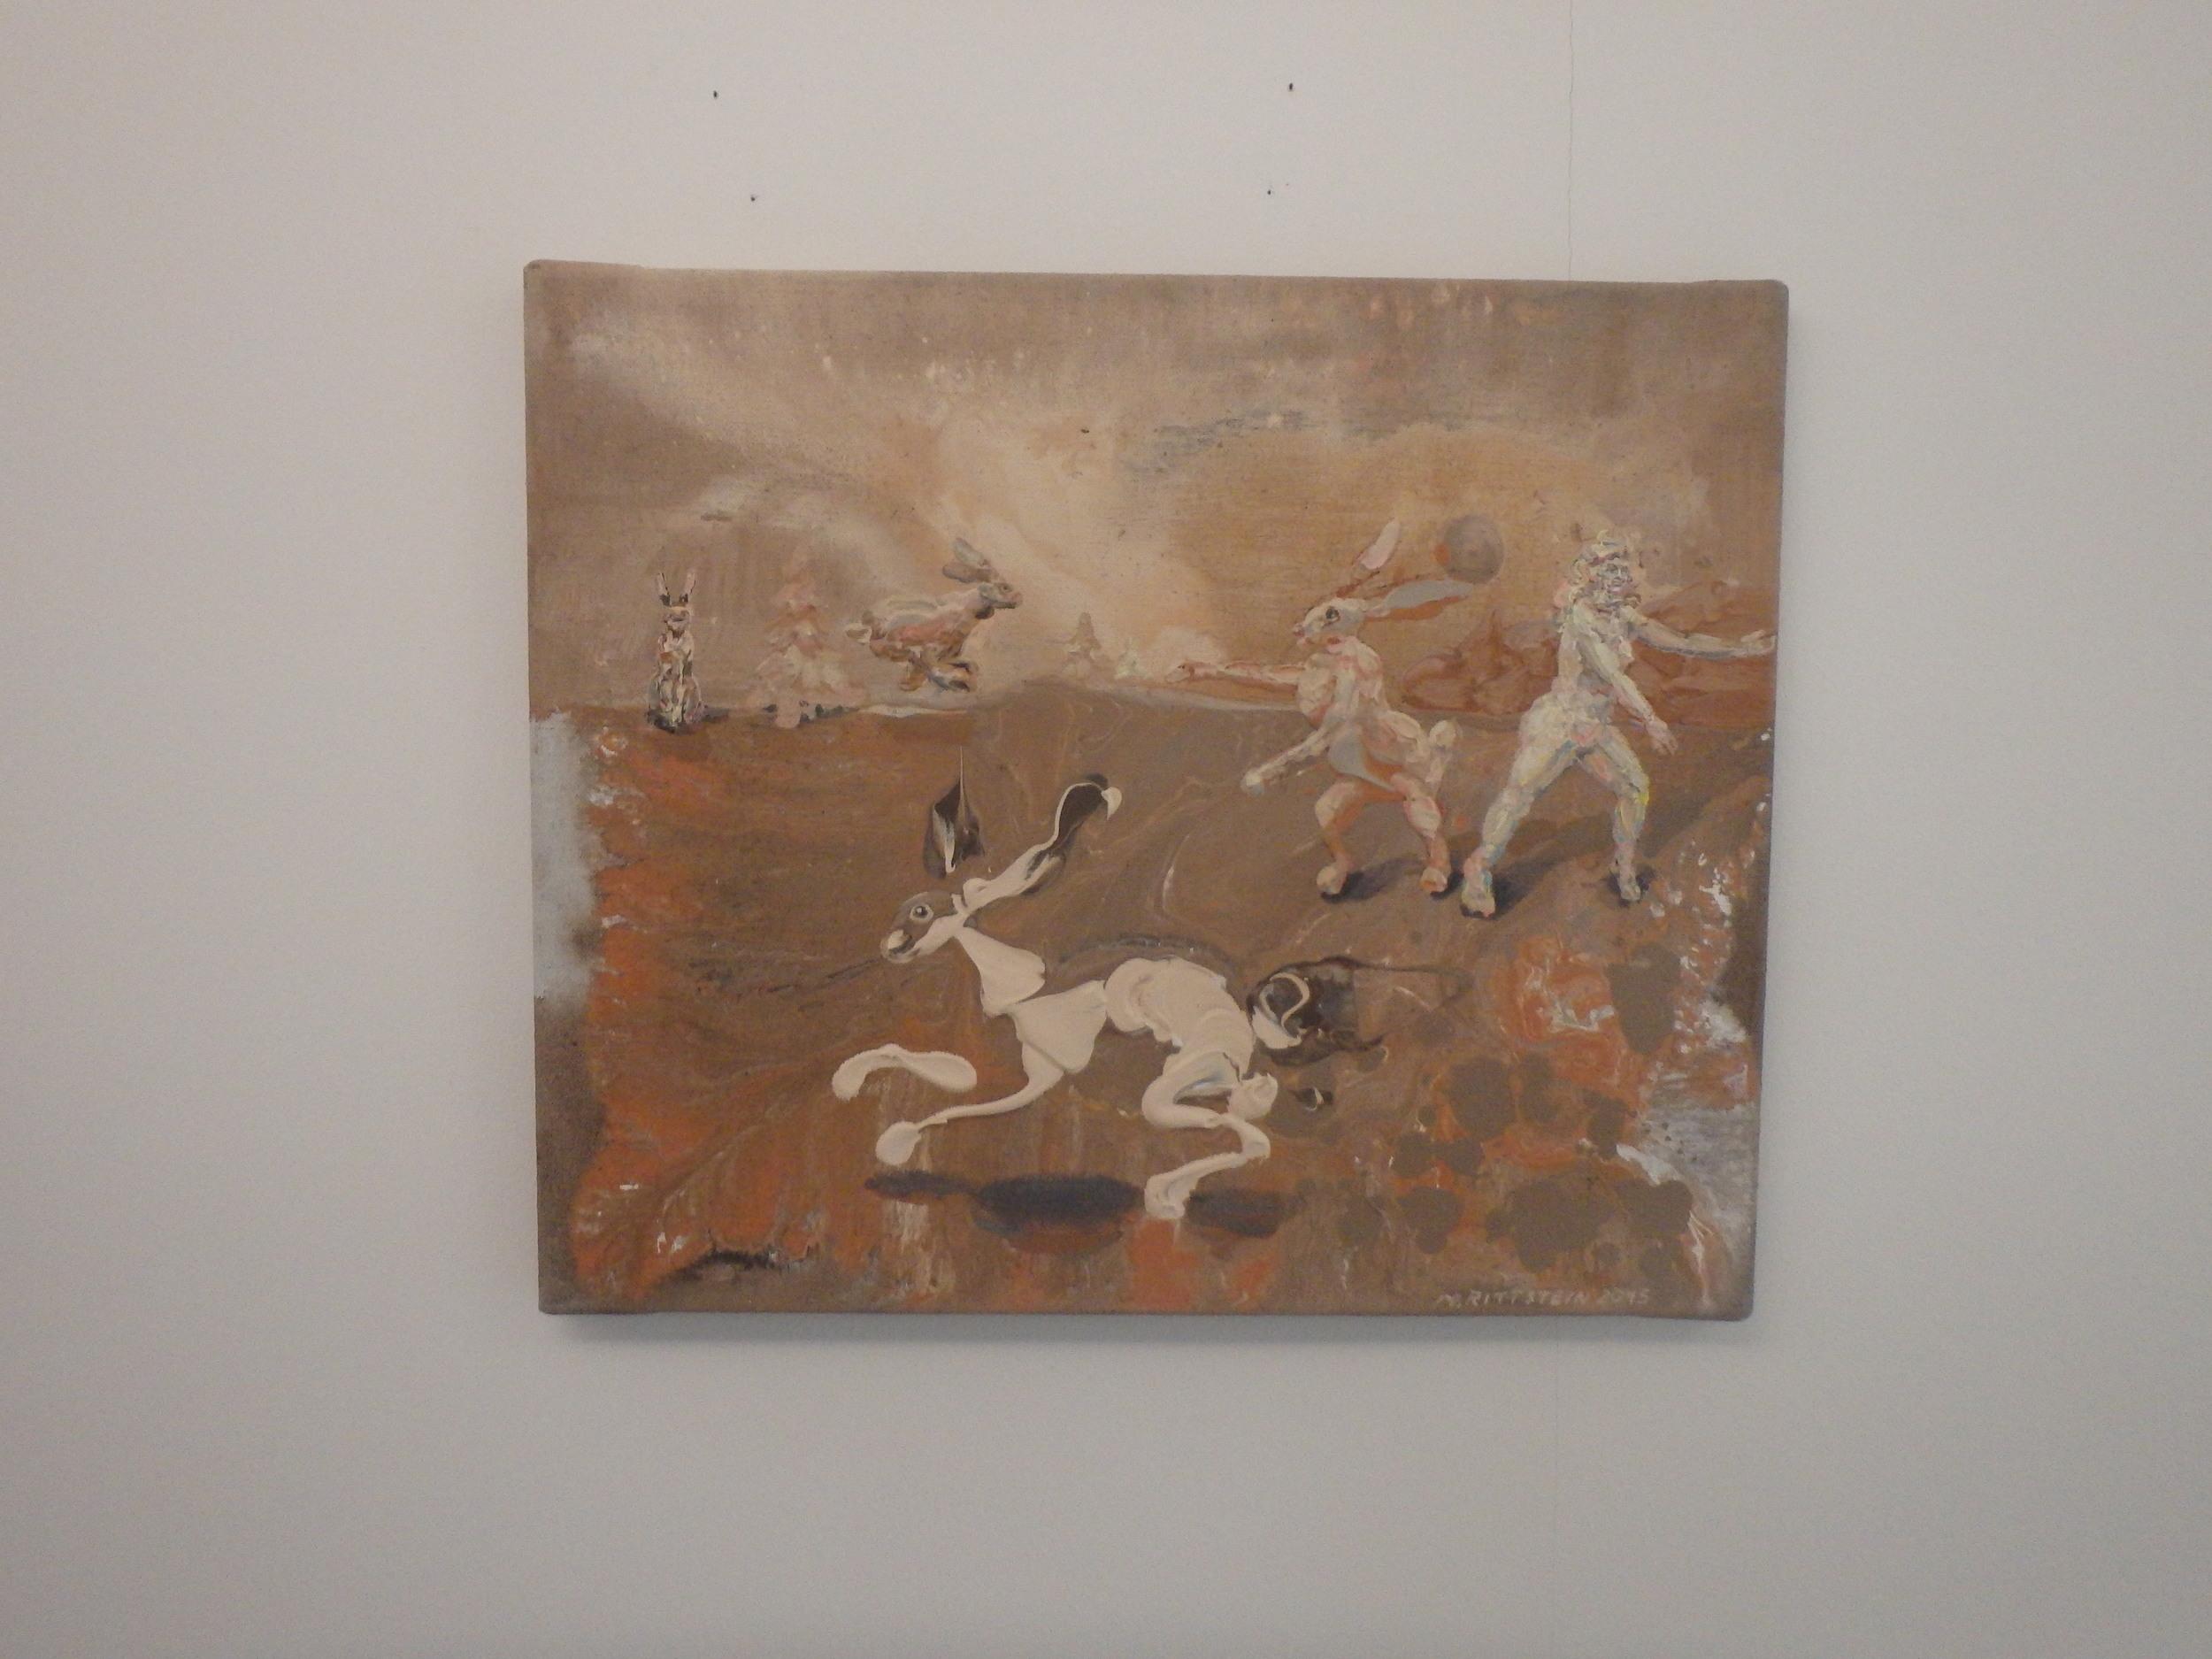 Michael Rittstein, Kurzy začínají na podzim (obvykle), 2015, plátno, akryl 60 x 50 cm